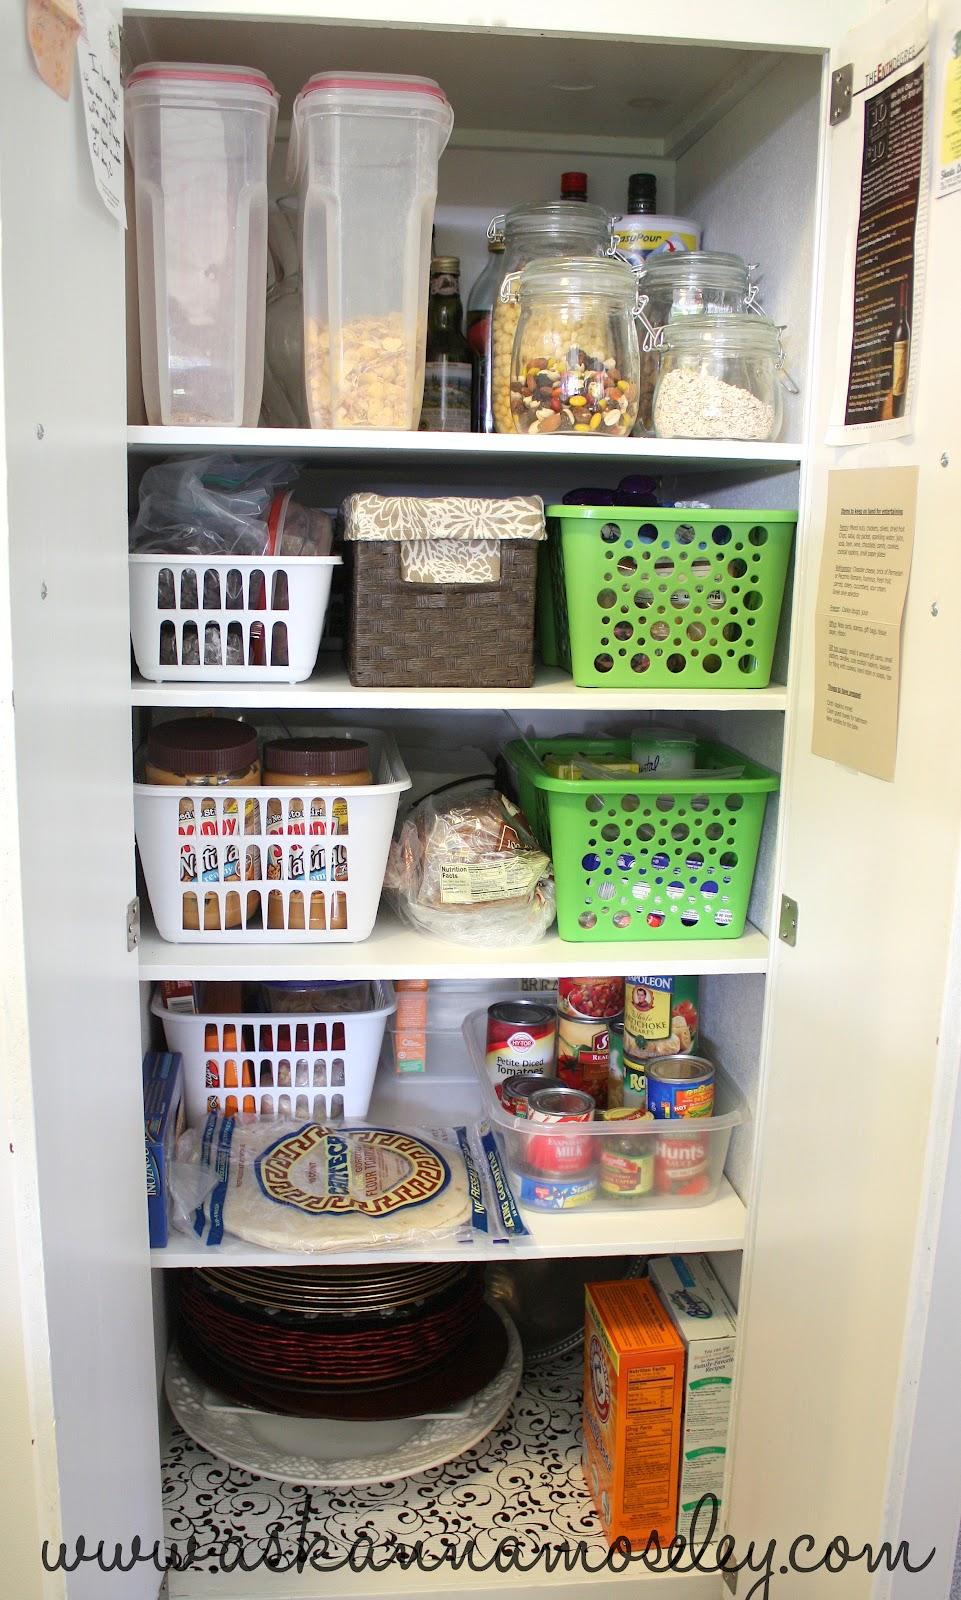 spring into organization ~ kitchen organization tips - ask anna